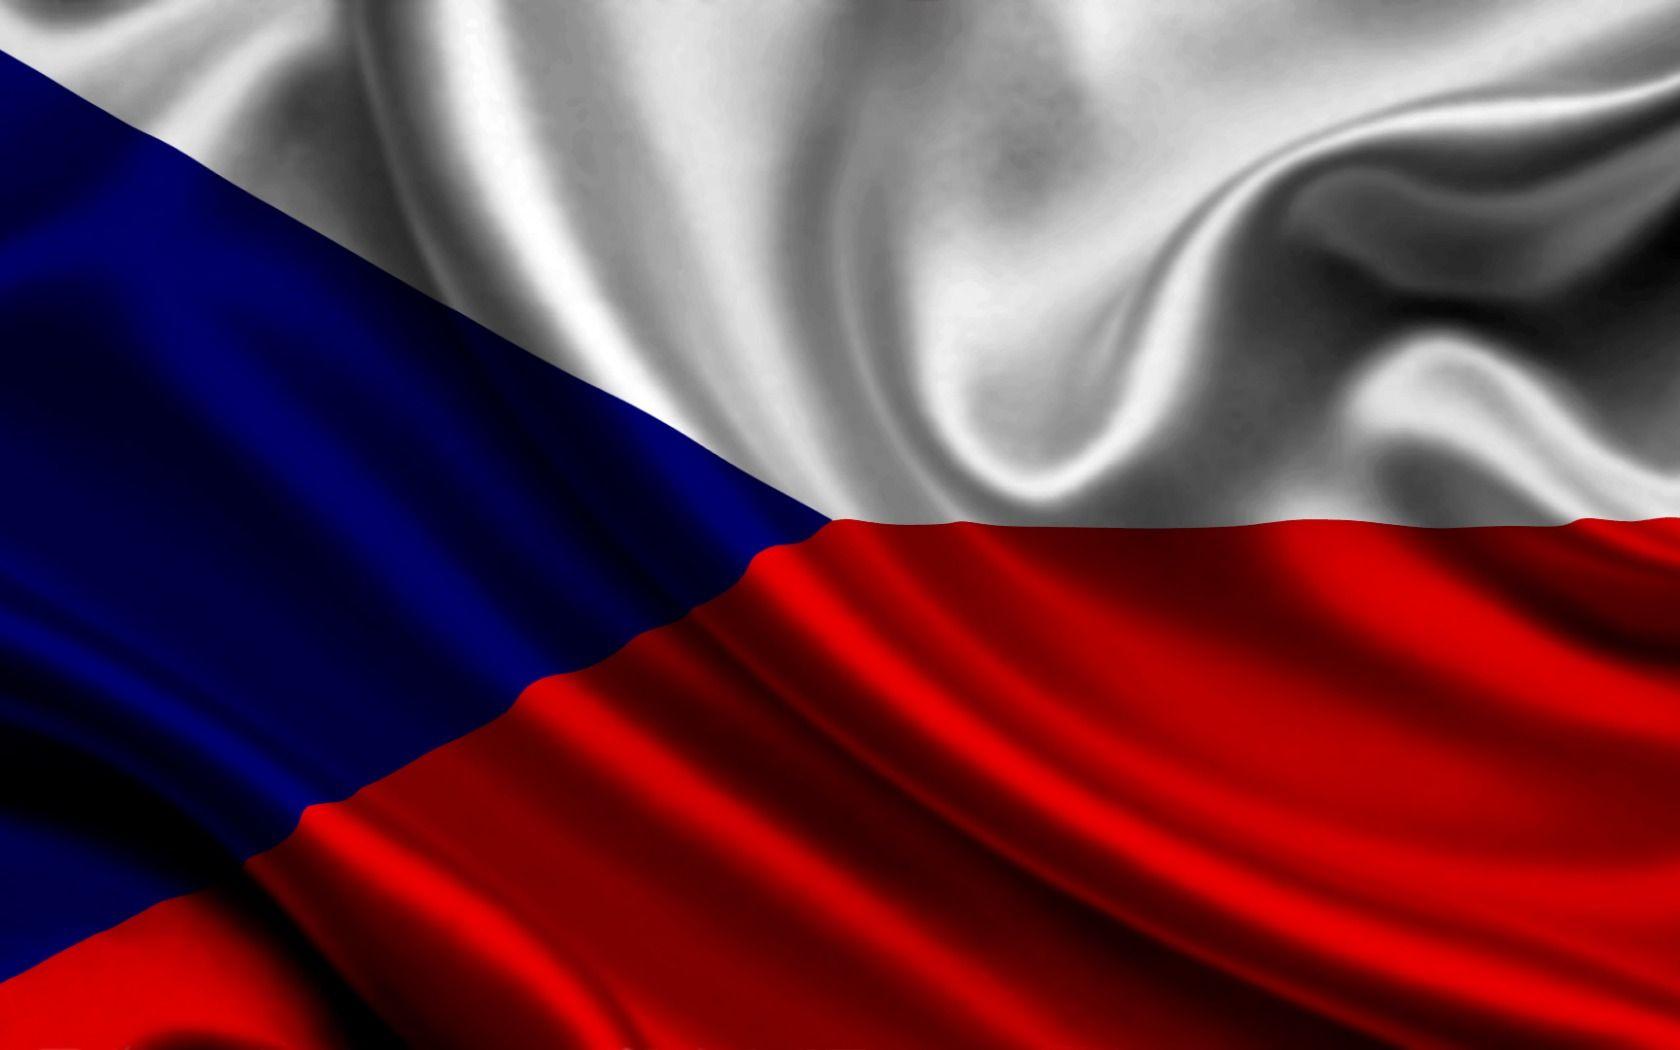 Czechoslavia National Football Team Background 10